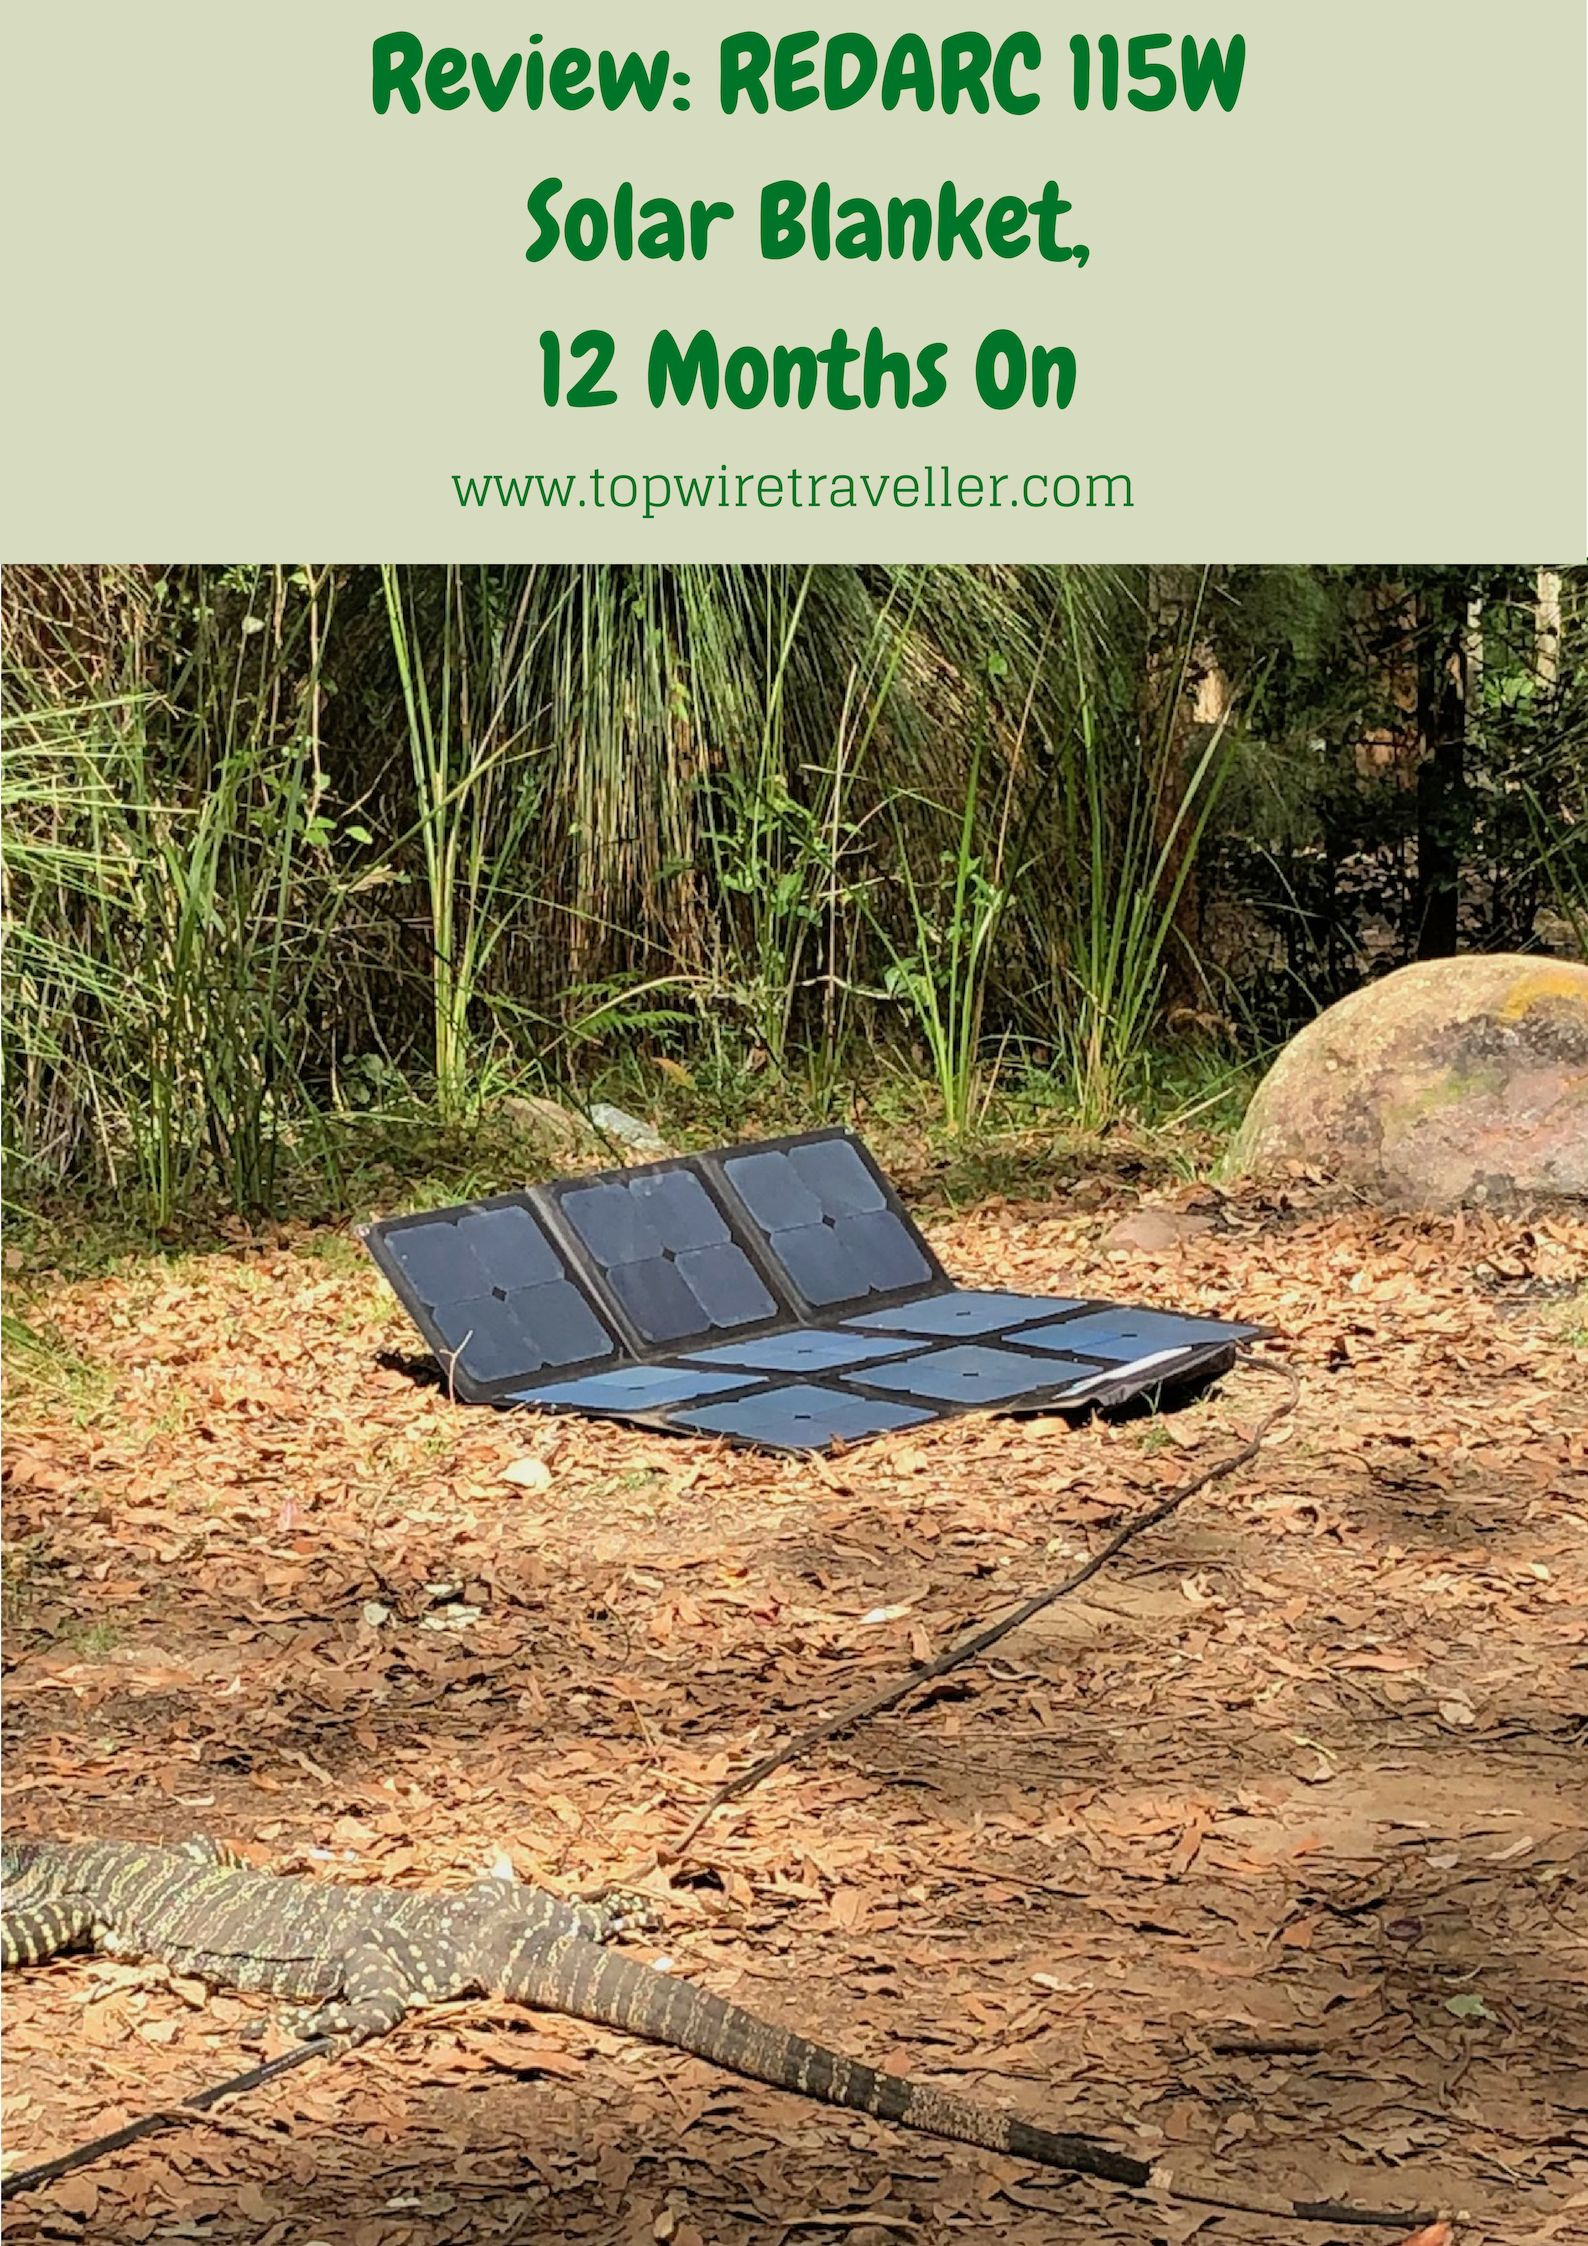 Review REDARC 115W SunPower® Cell Solar Blanket Solar